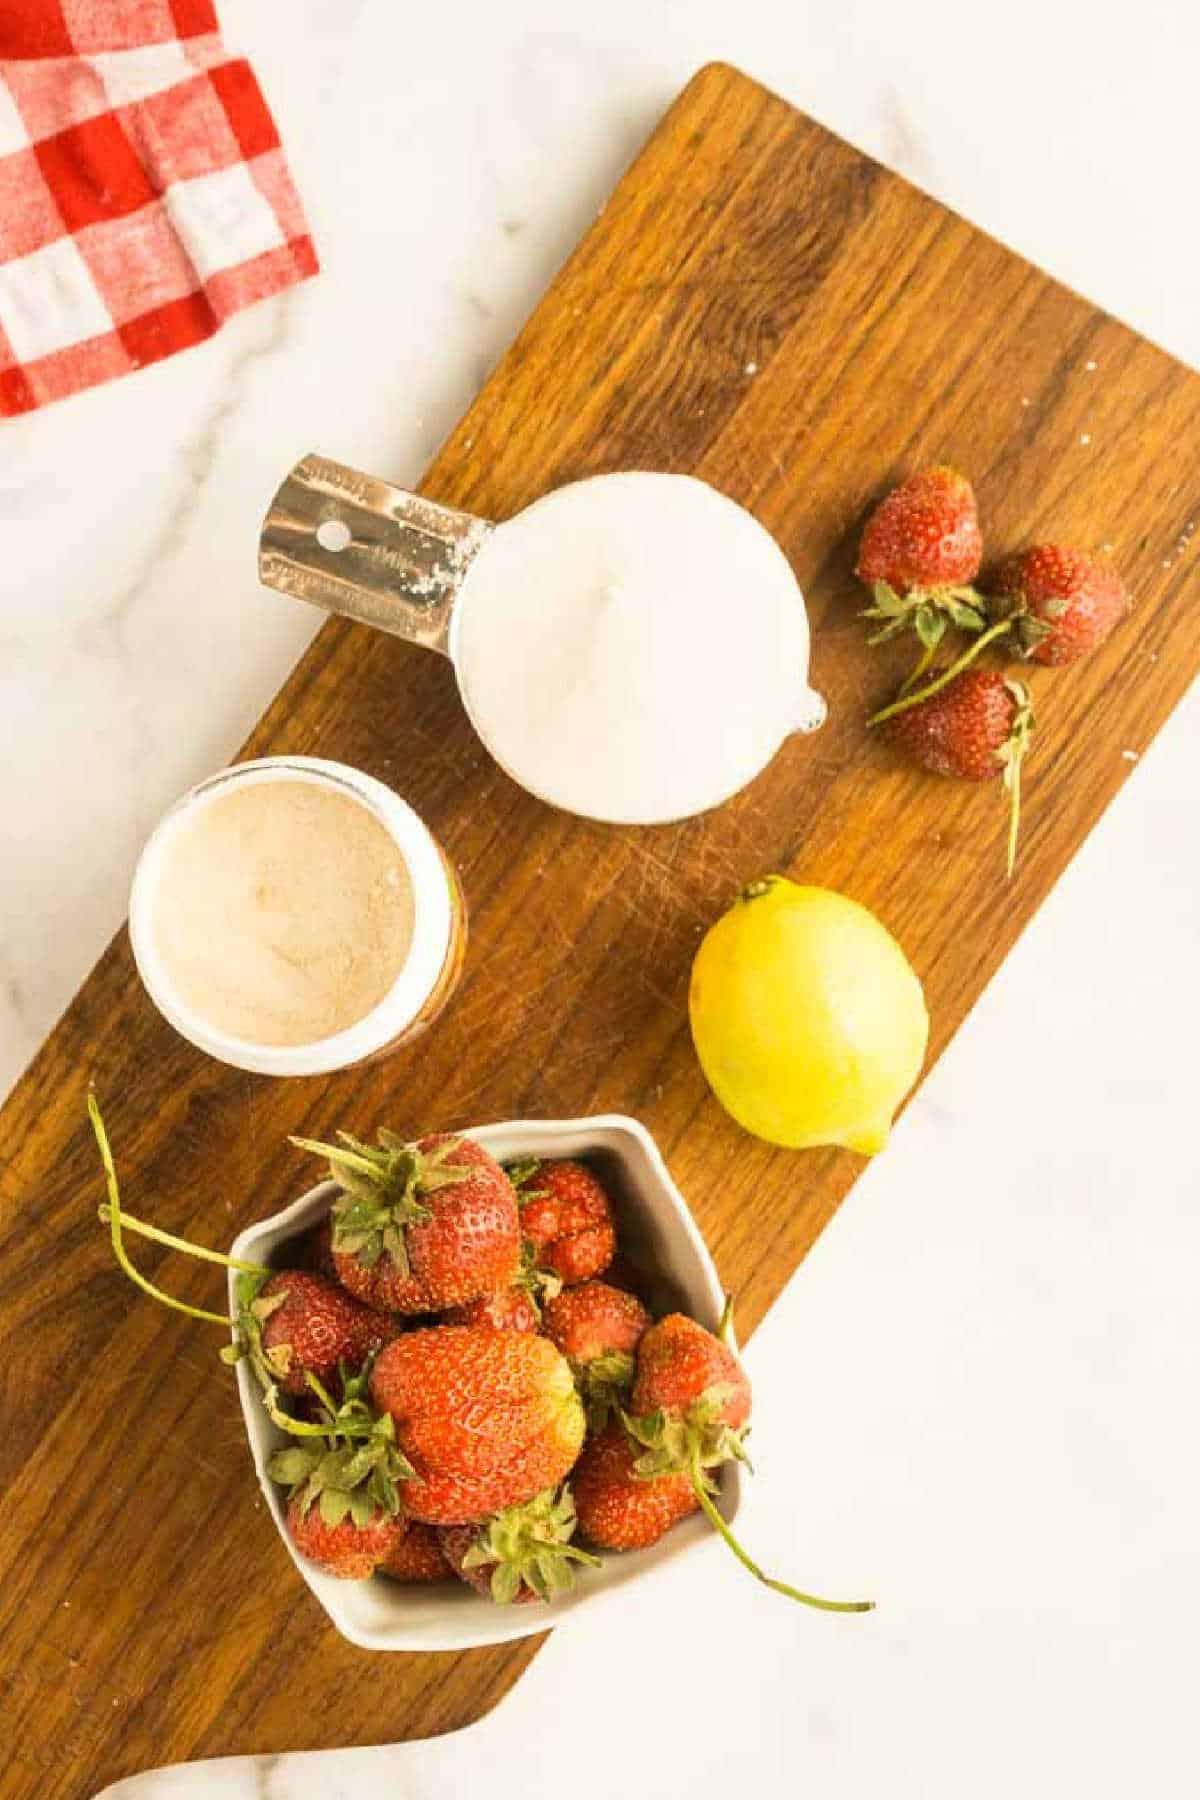 cutting board with sugar, pectin, fresh strawberries, and lemon